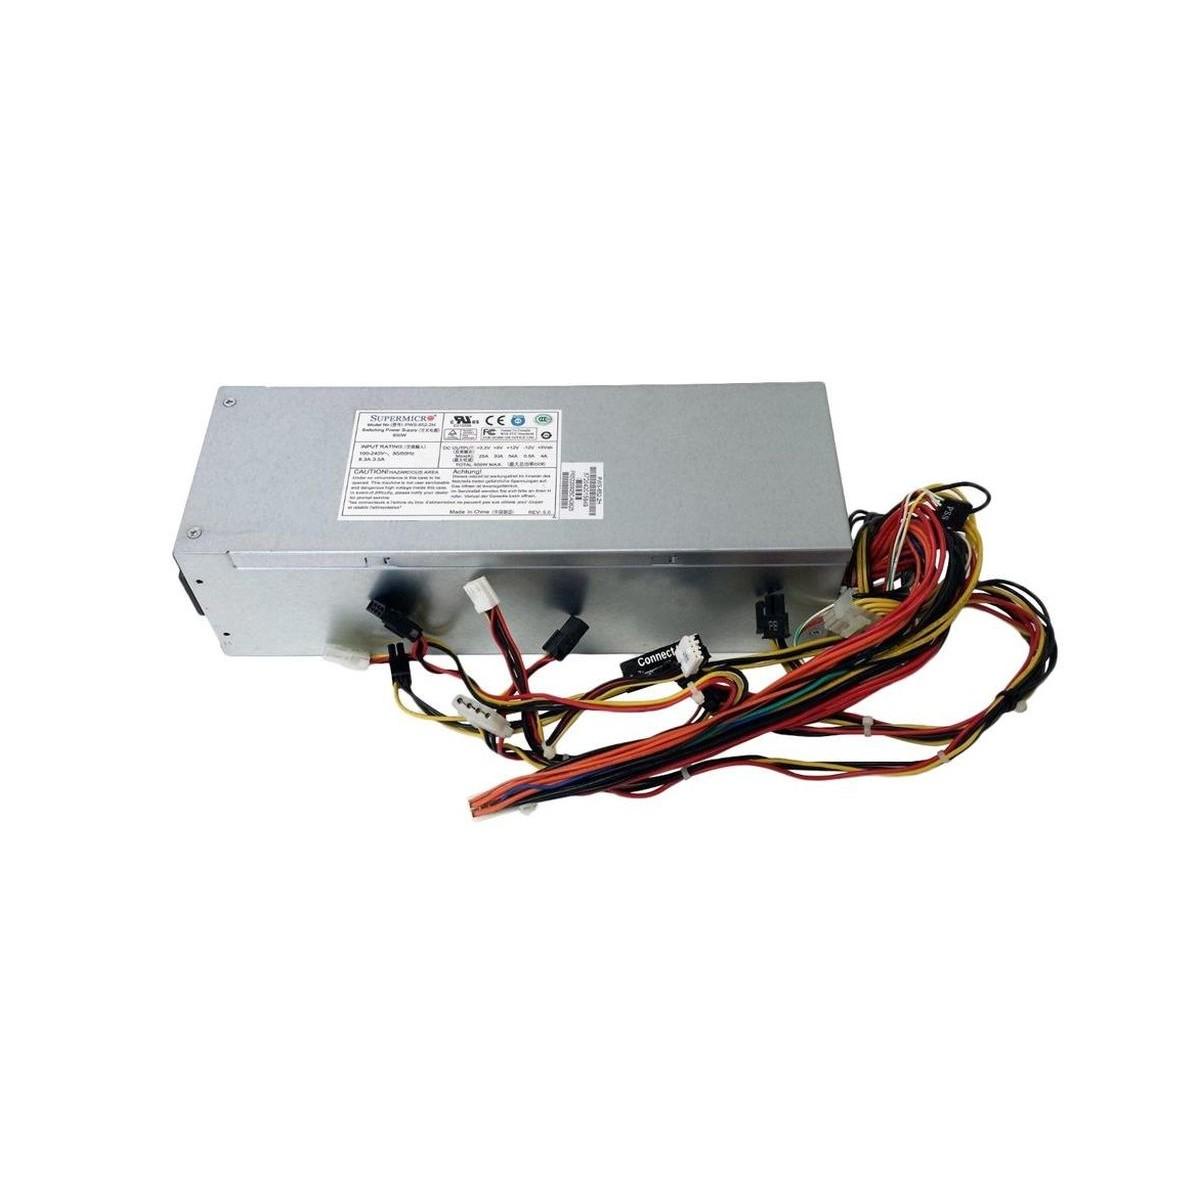 DYSK 1TB WD RED SATA III 6G 5.4K 2,5 9.5mm WD10JFCX